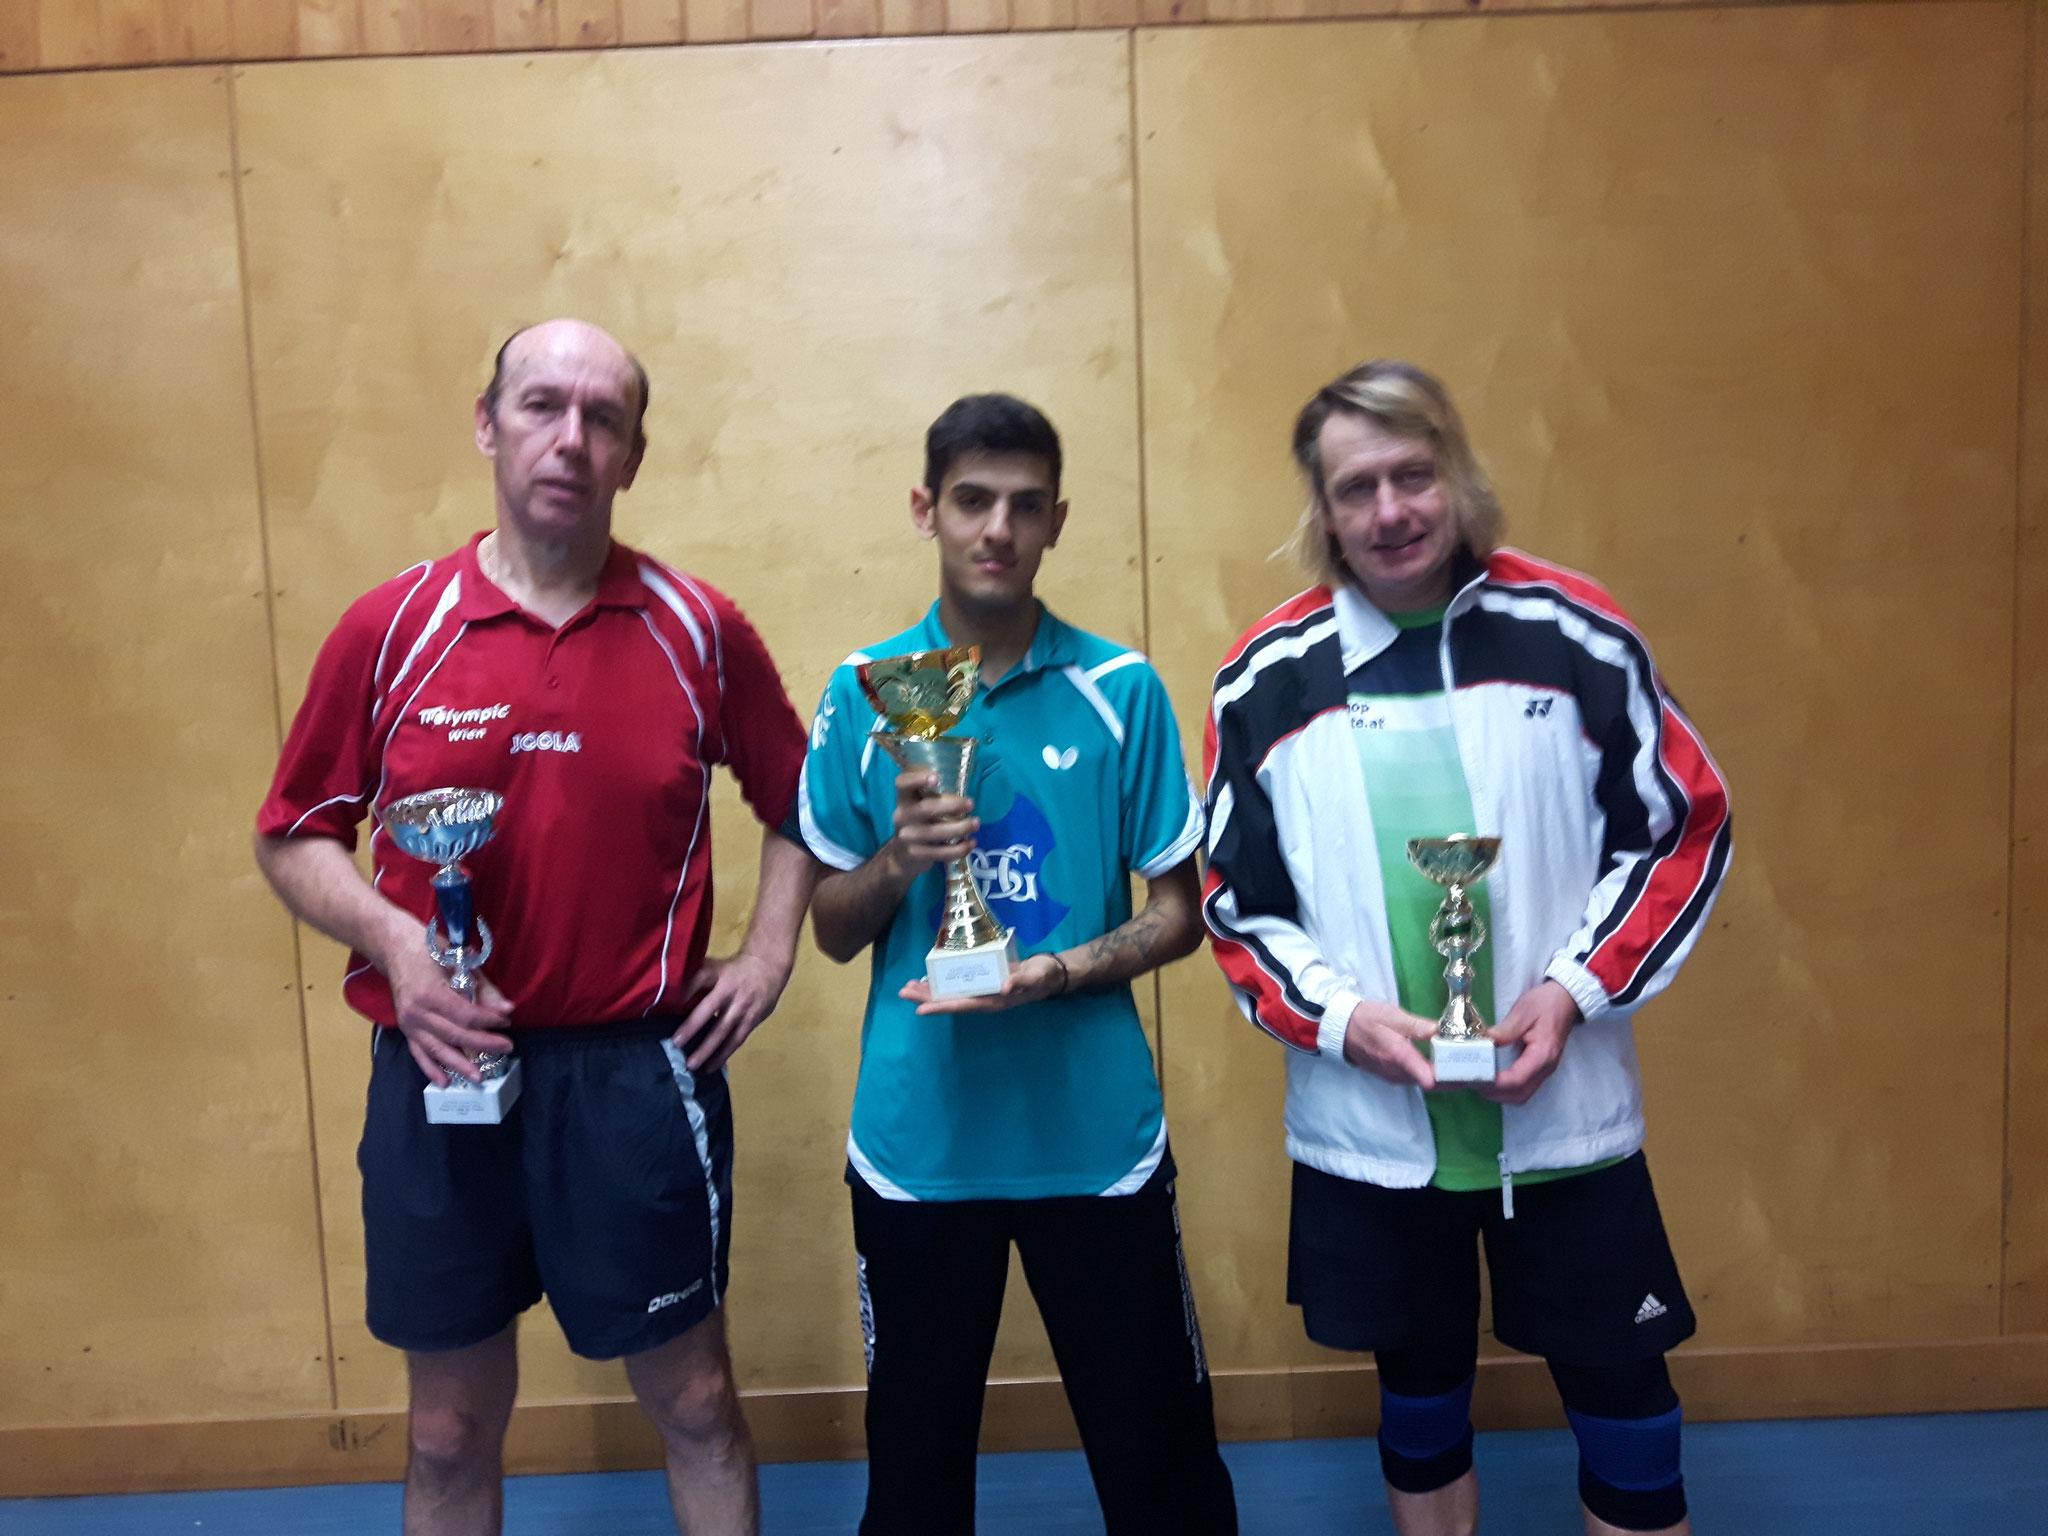 Siegerfoto Bewerb A: v.l.n.r. Jaroslaw Gaborcik (OLY) (Platz 2), Ugljesa Lukic (Sieger), Peter Fichte (HALL) (Platz 3)